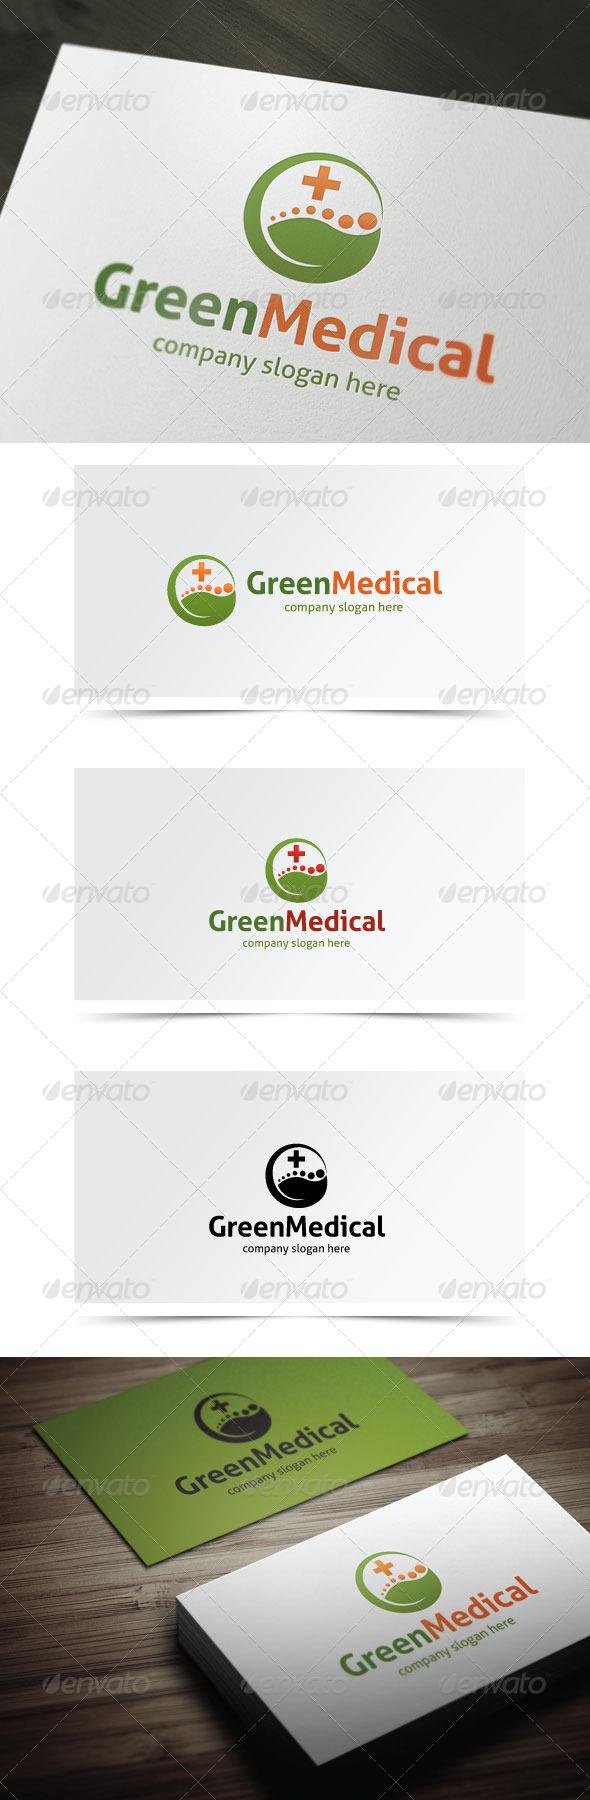 Green Medical - Nature Logo Templates